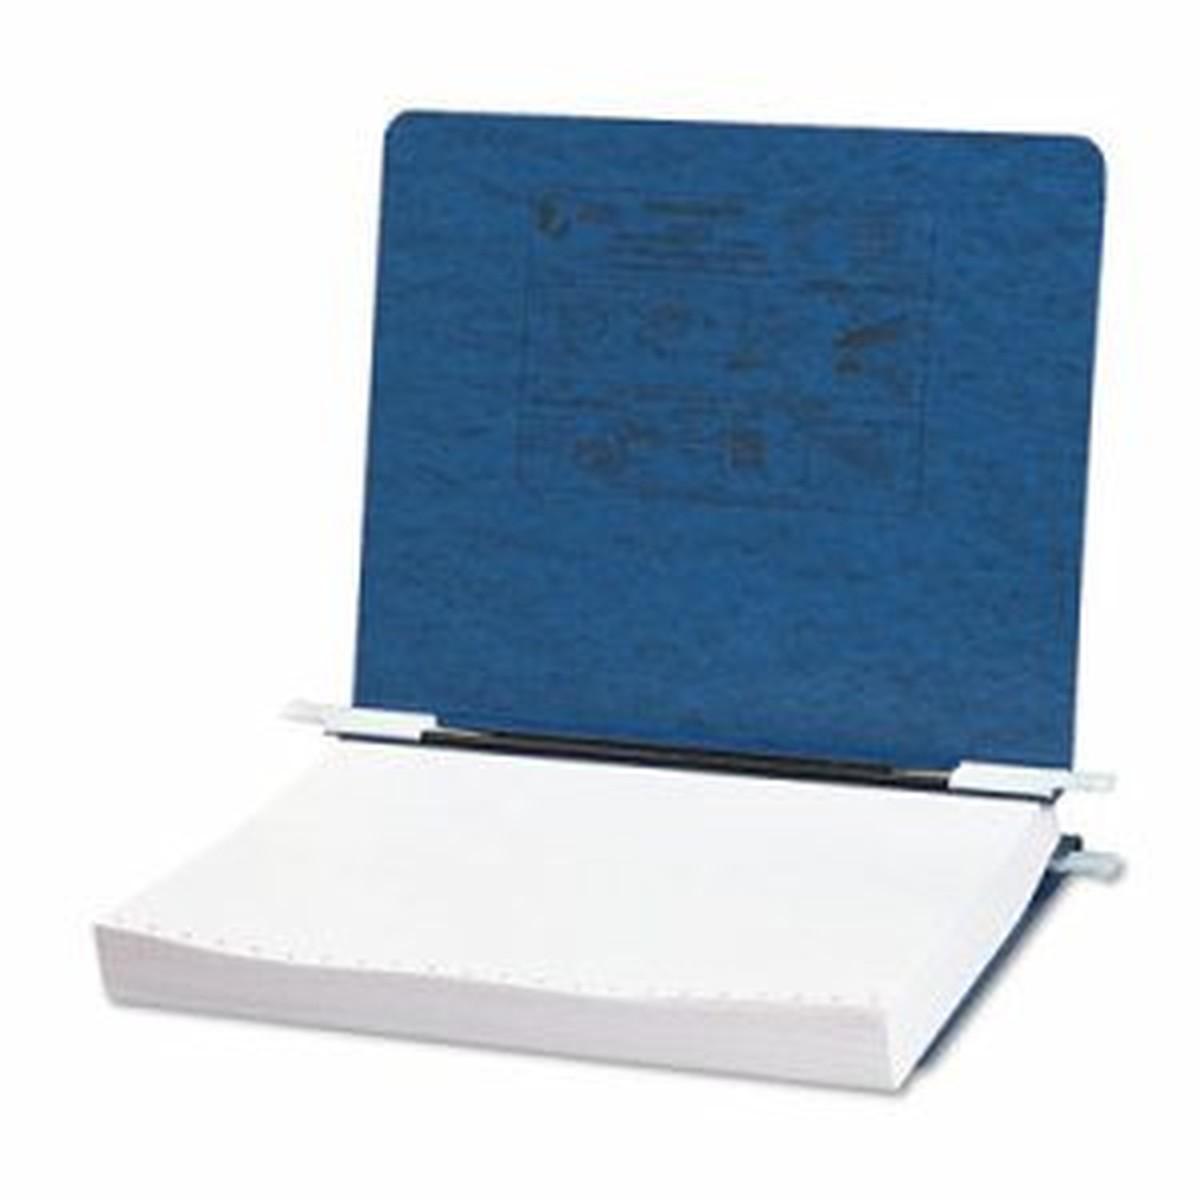 "PRESSTEX Covers w/Storage Hooks, 6"" Cap, Dark Blue"